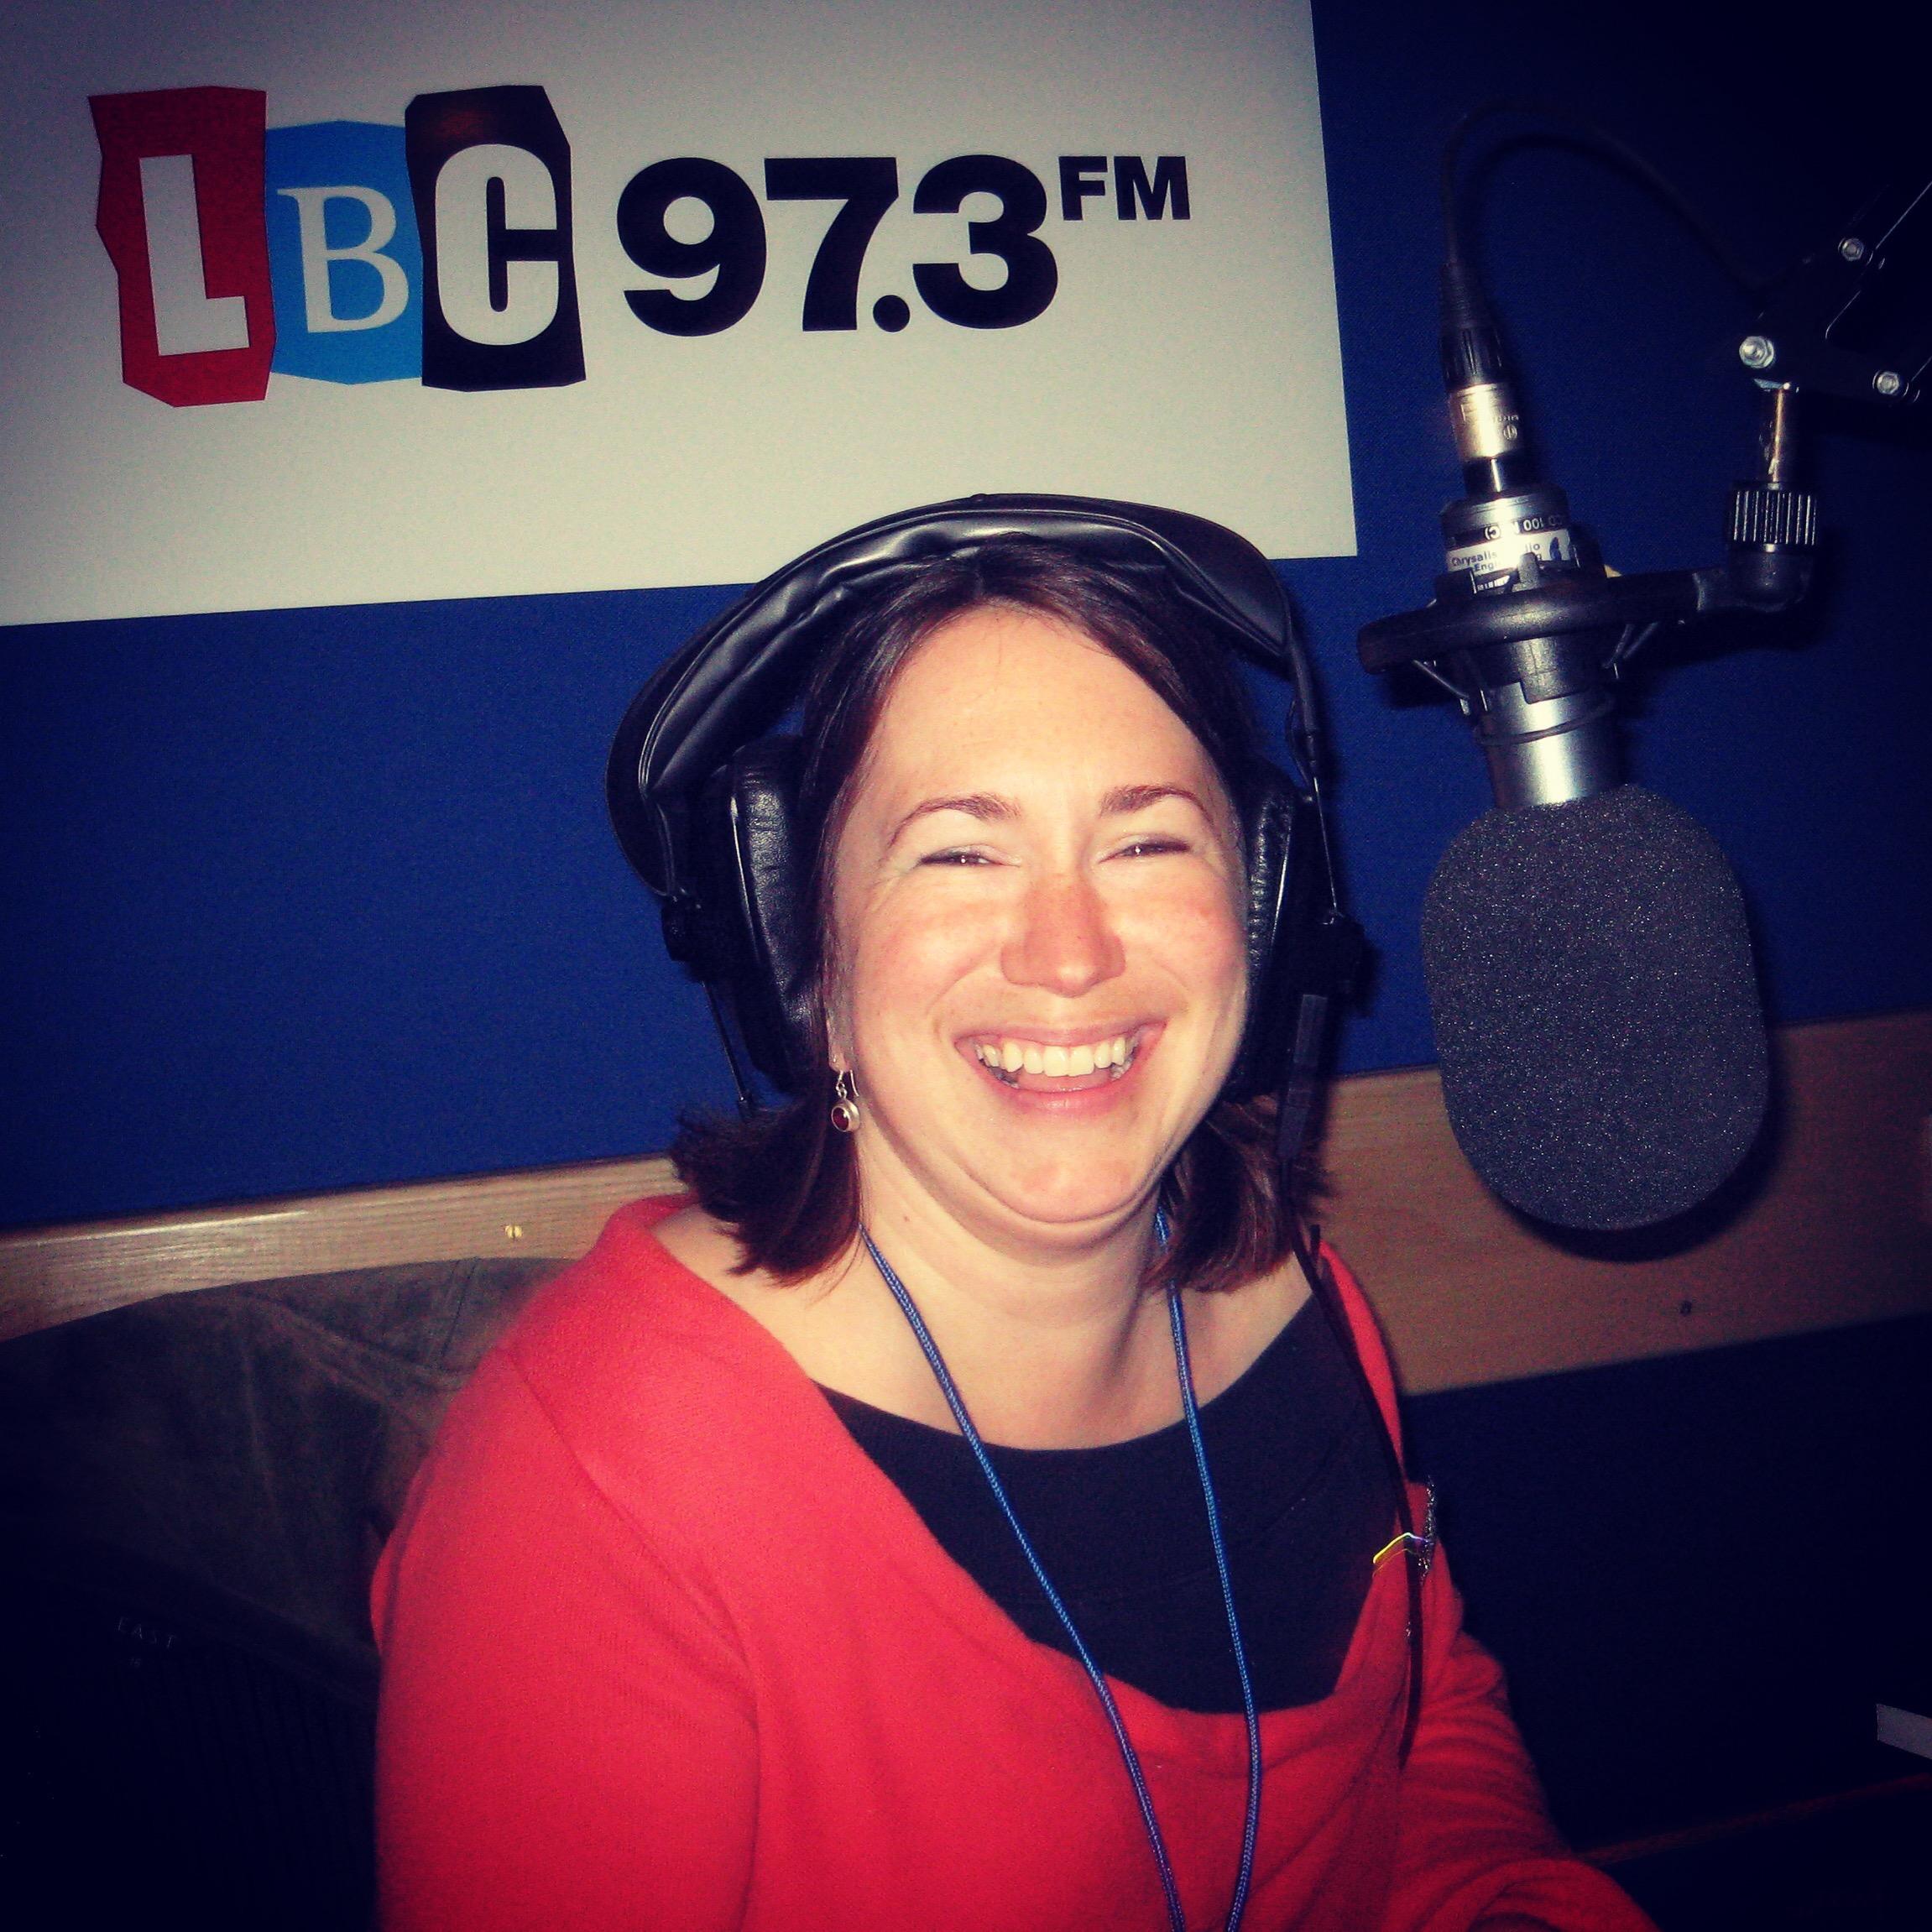 Becky in the LBC studio